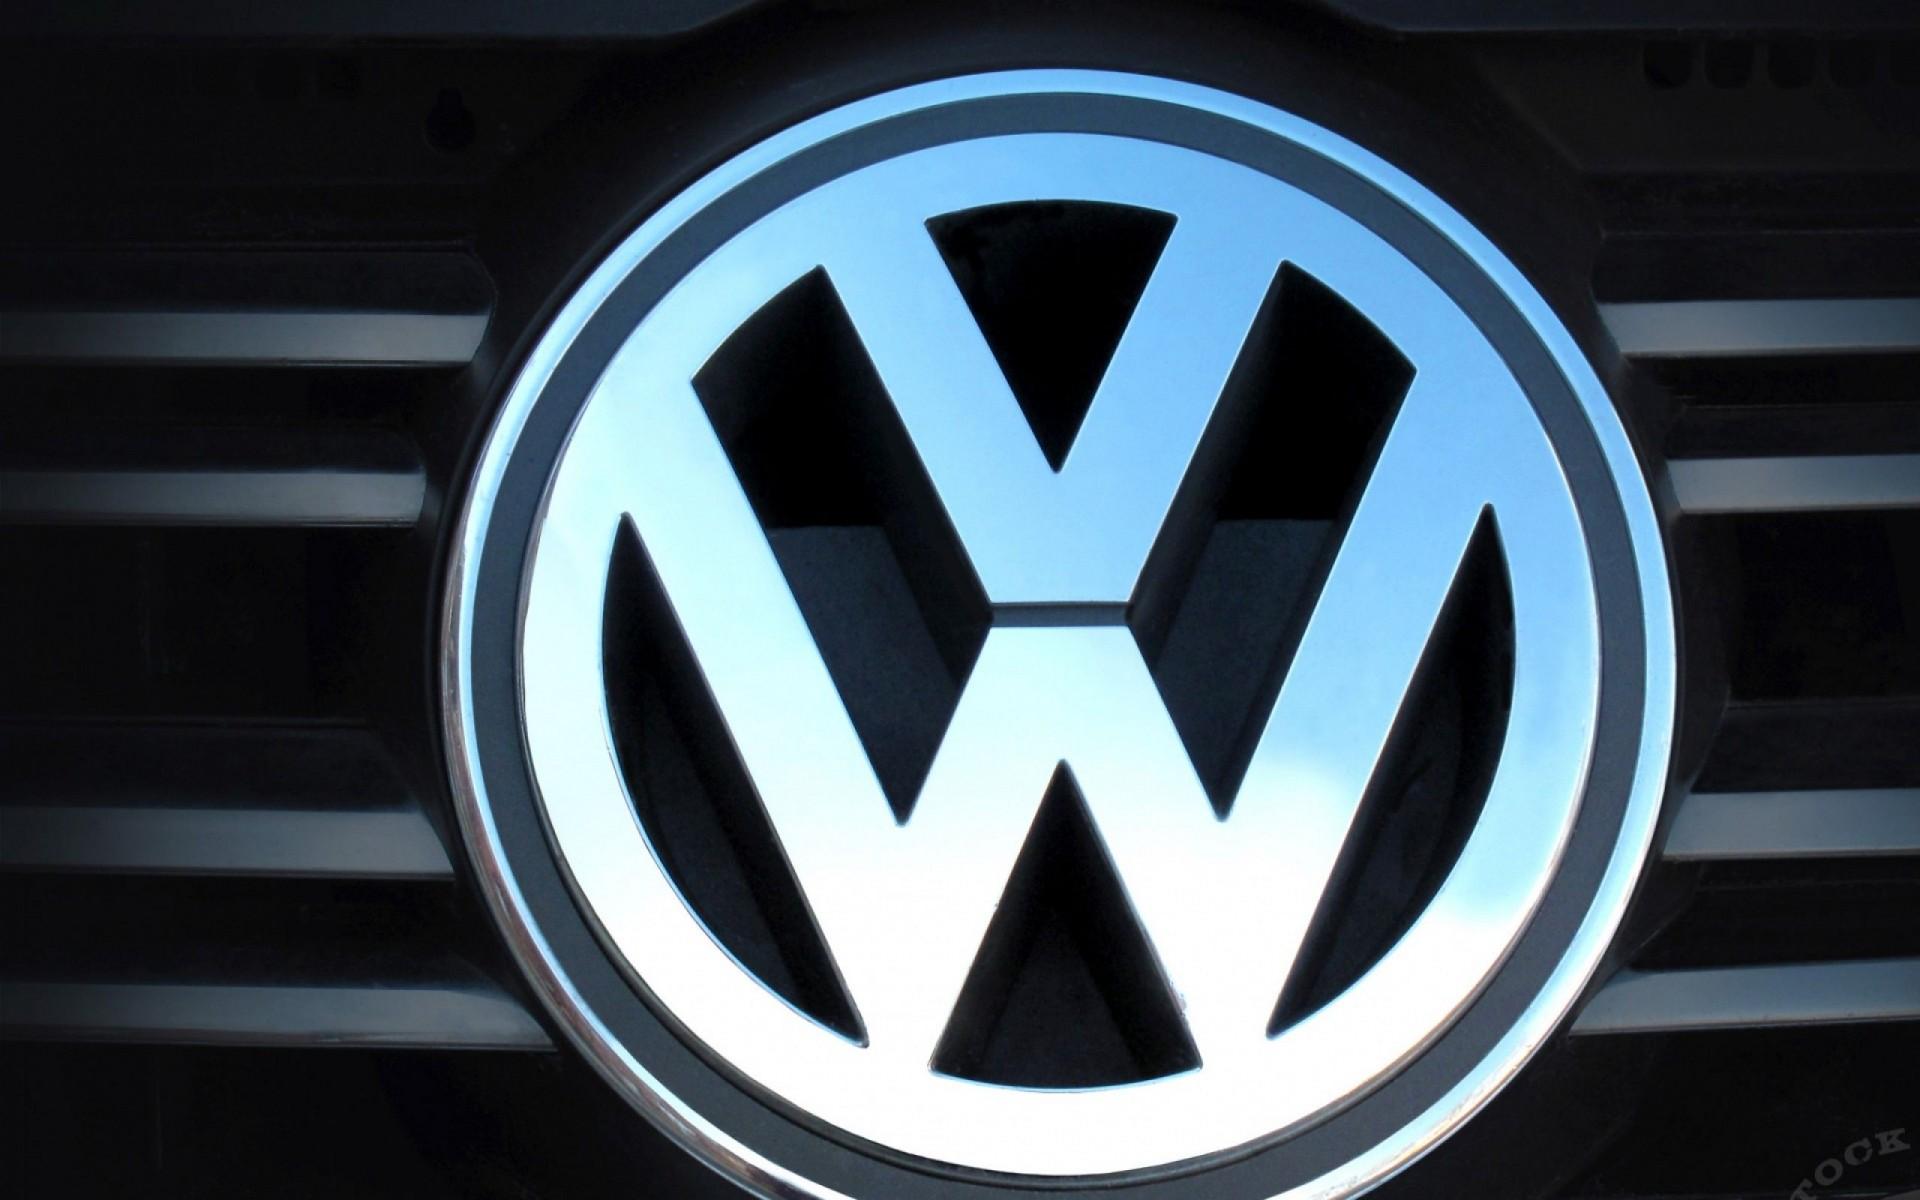 Volkswagen logo wallpapers 2013 vdub newscom 1920x1200